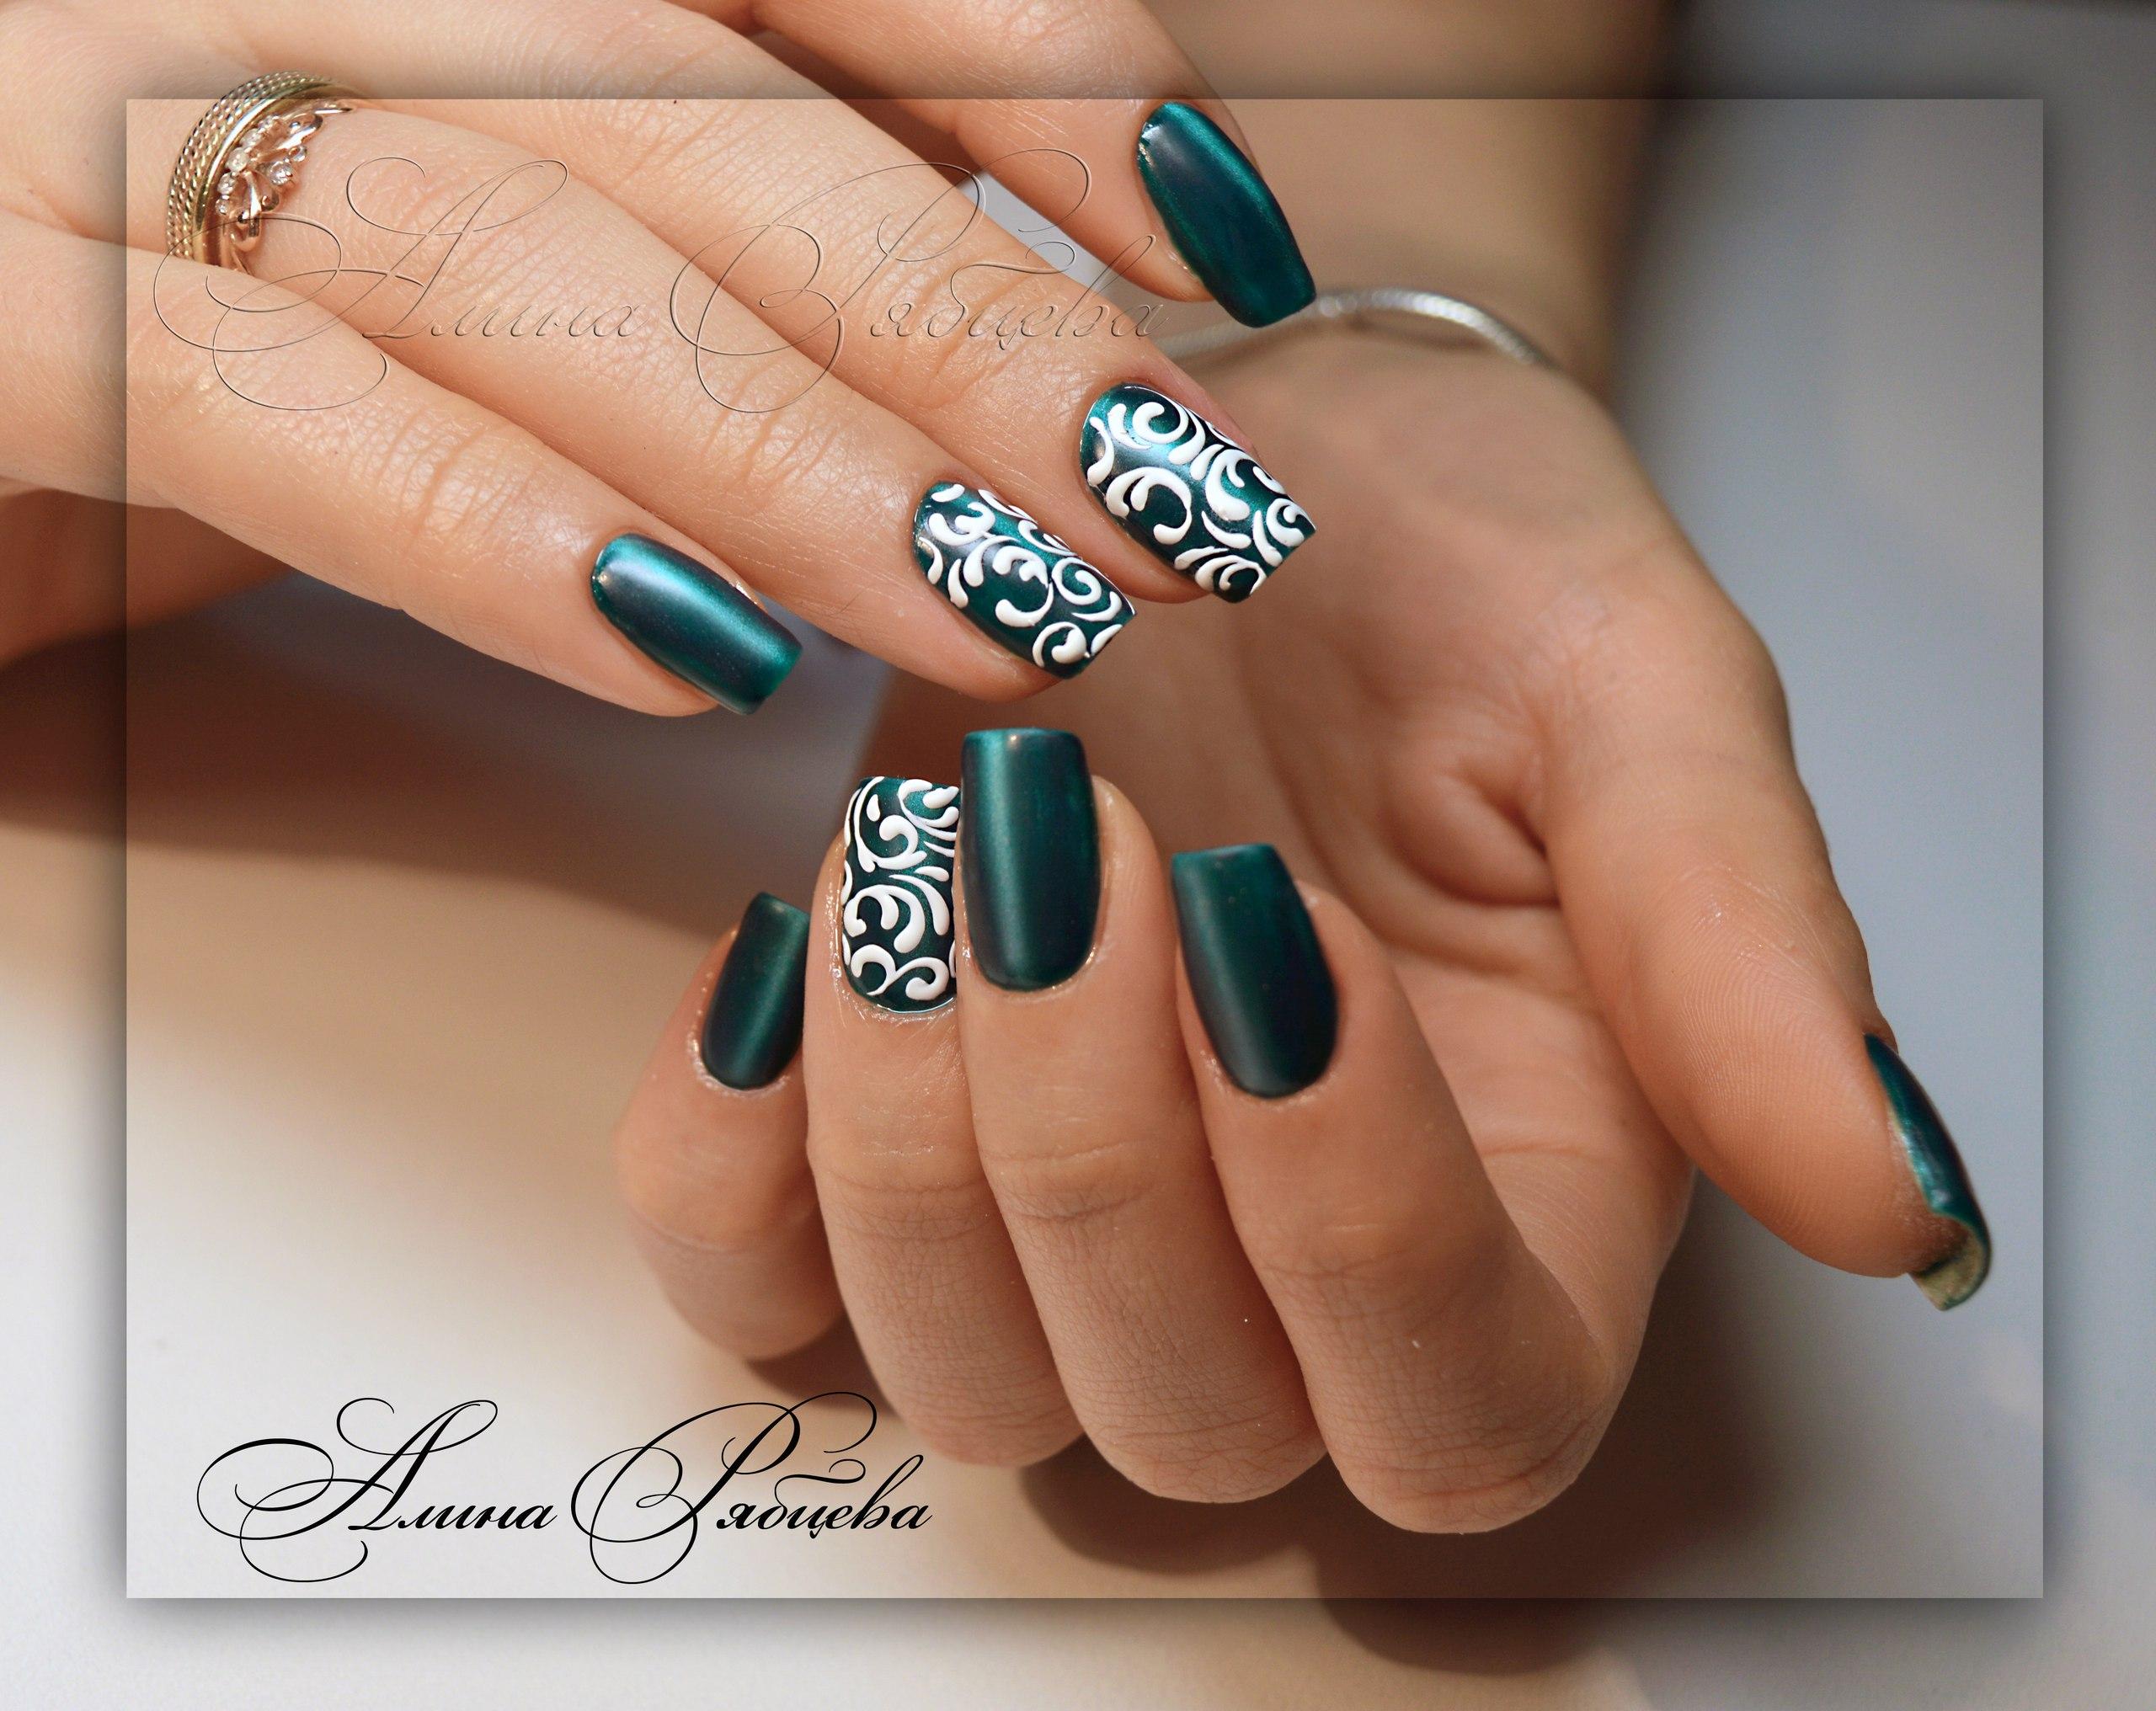 Дизайн нарощенных ногтей фото новинок